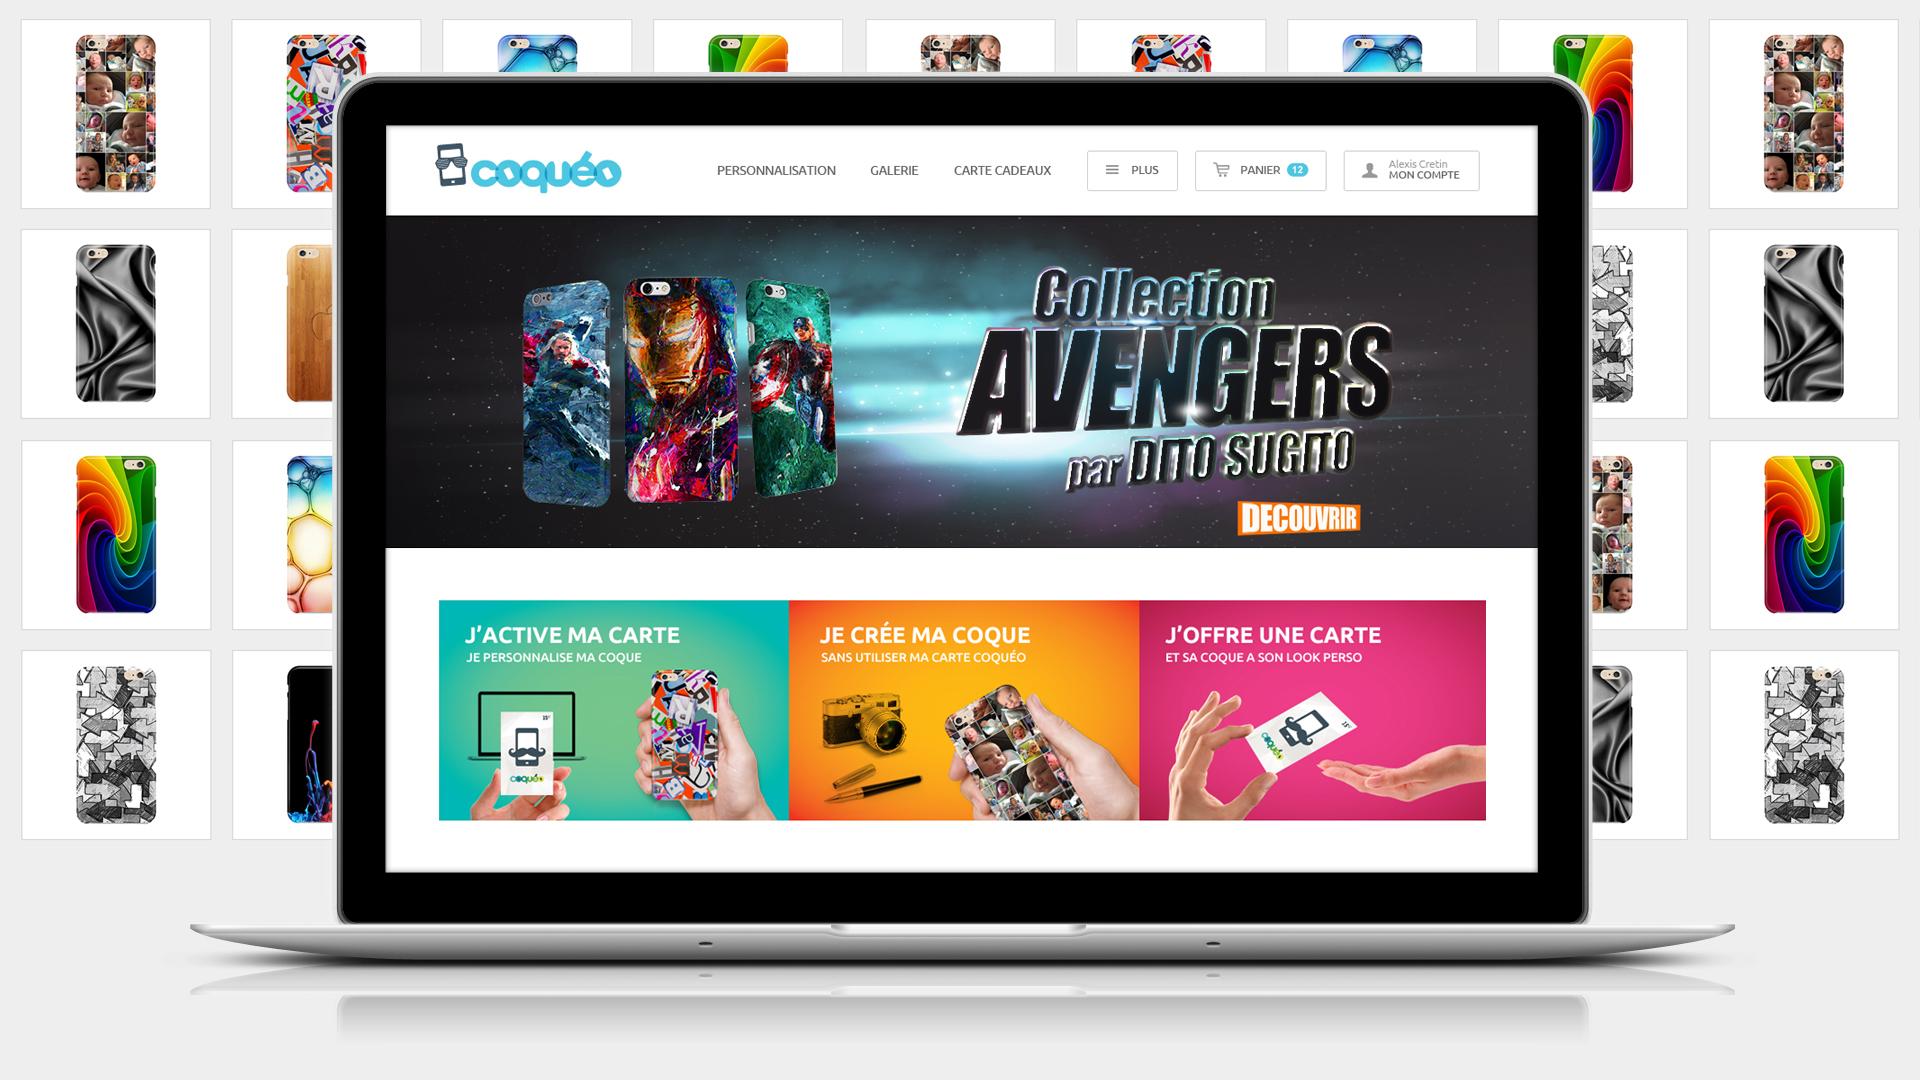 coqueo-creation-site-coque-mobile-smartphone-personnalisation-caconcept-alexis-cretin-graphiste-montpellier